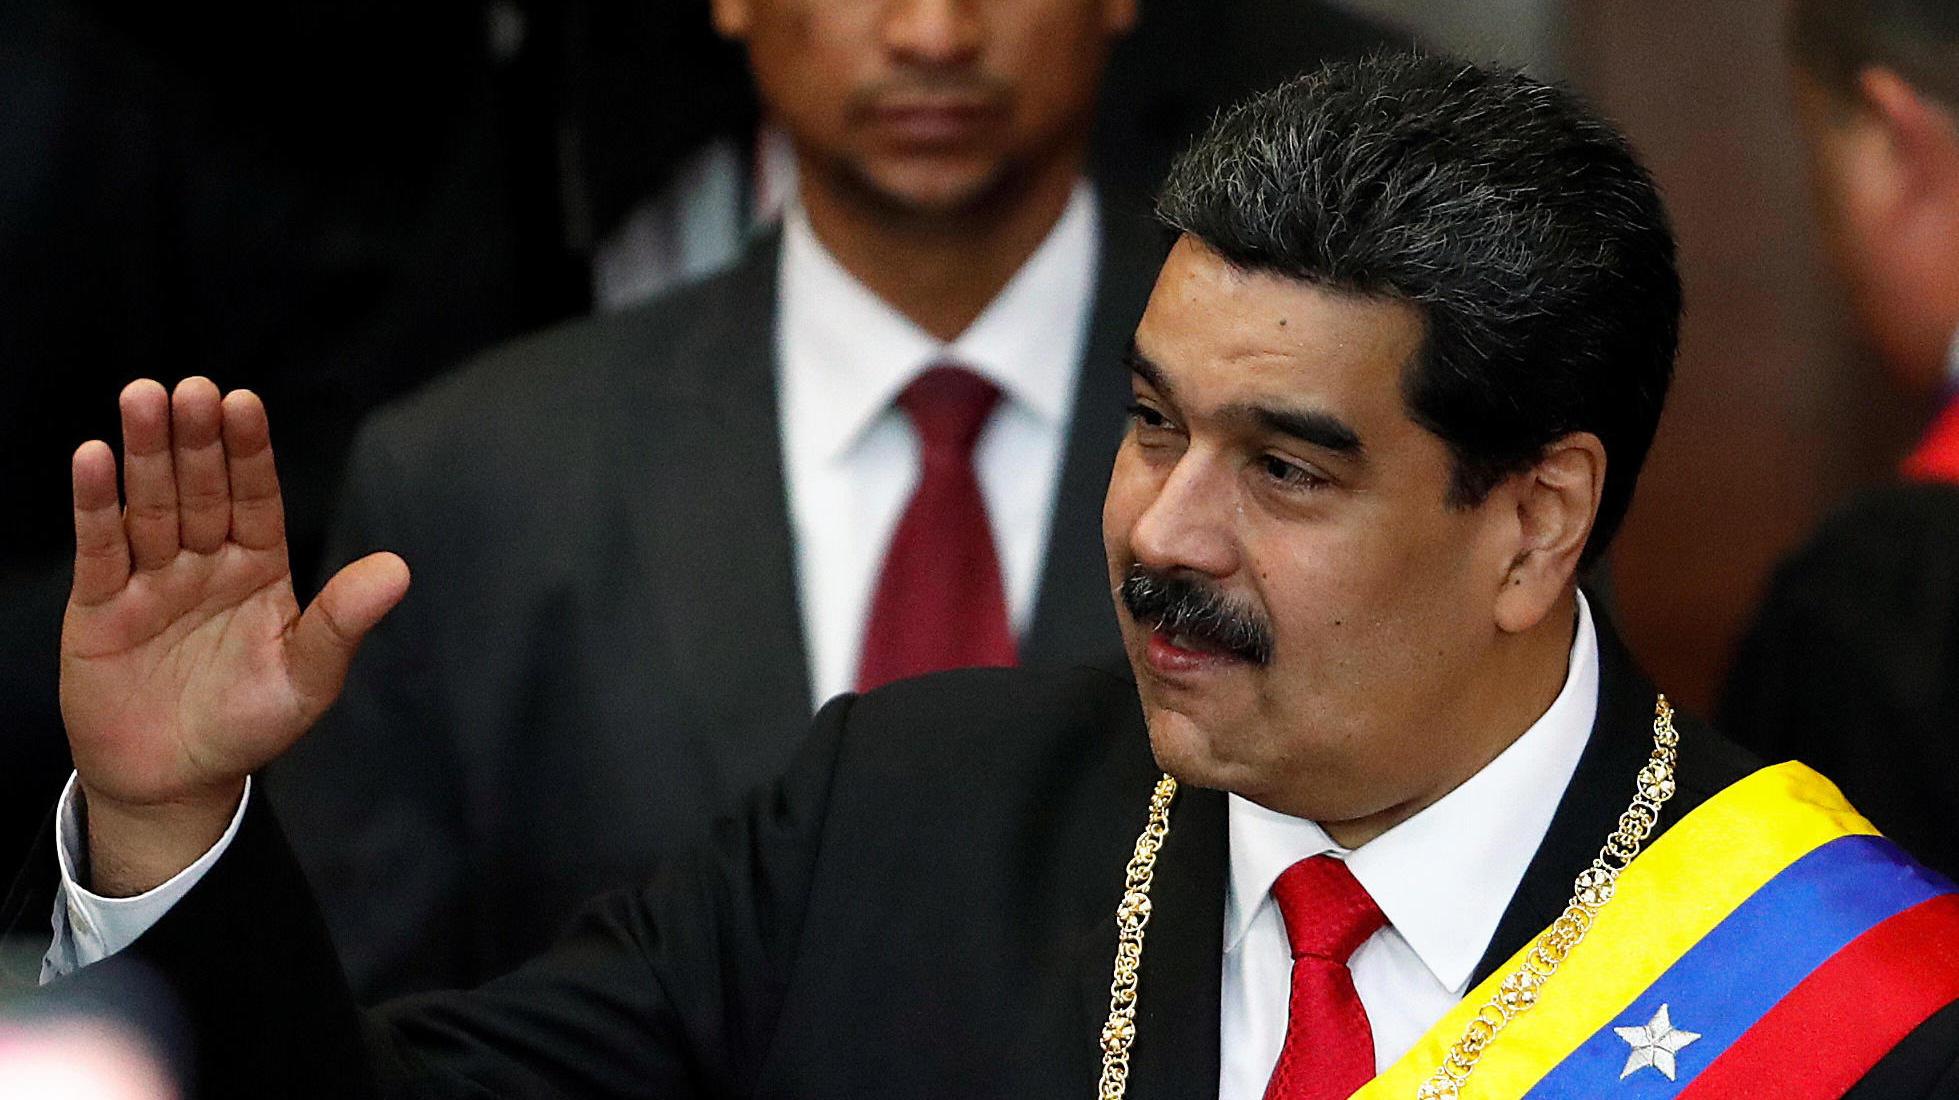 Nicolás Maduro, Venezuela's sitting president, attending a ceremony in Caracas last week ( Image )